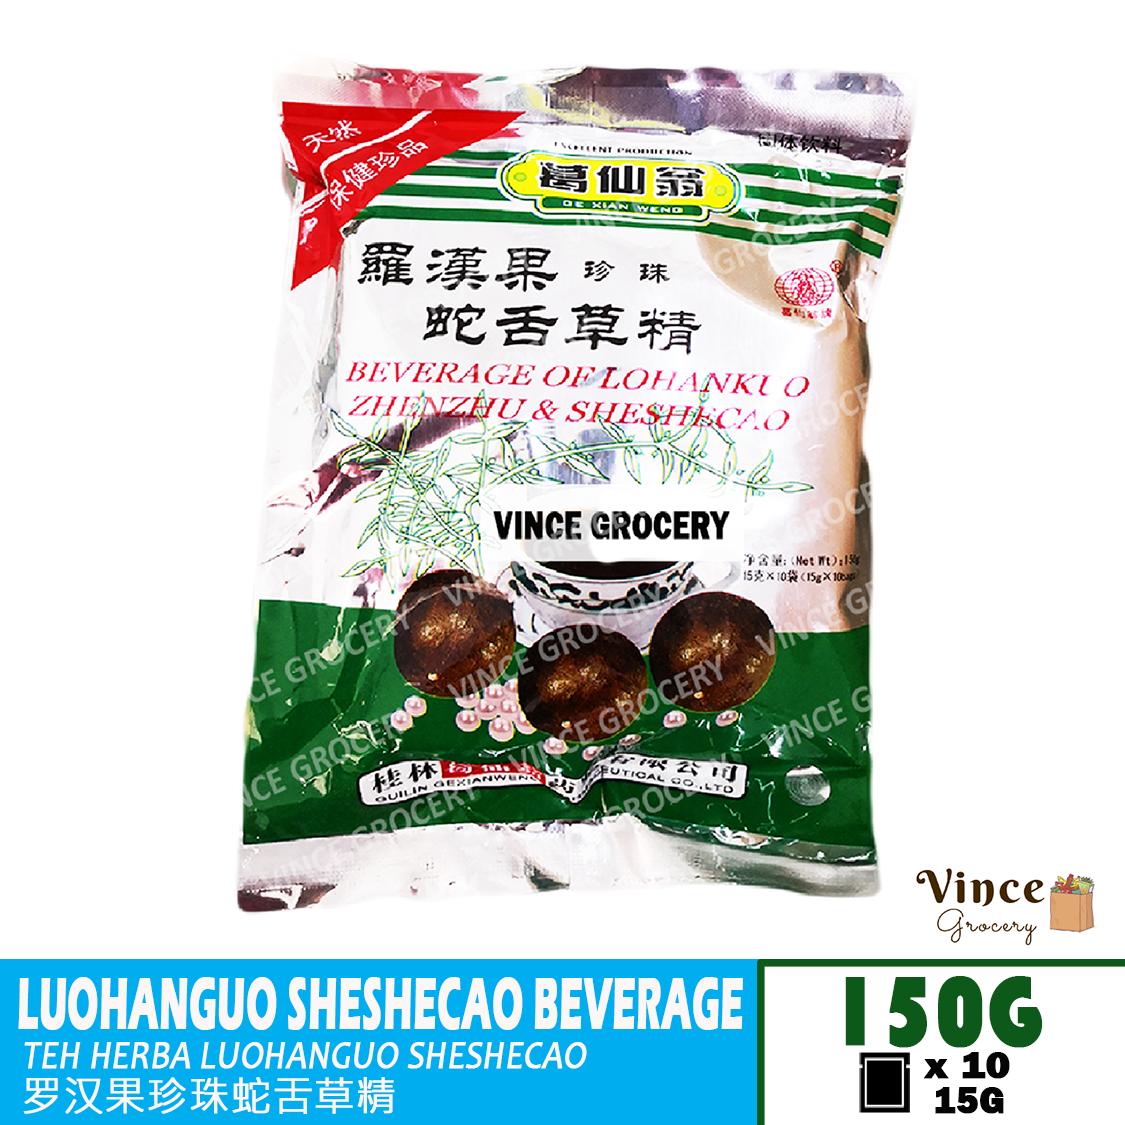 GE XIAN WENG Lohankuo Zhenzhu & Sheshecao Beverage  葛仙翁罗汉果珍珠蛇舌草精 150G (10's x 15G)